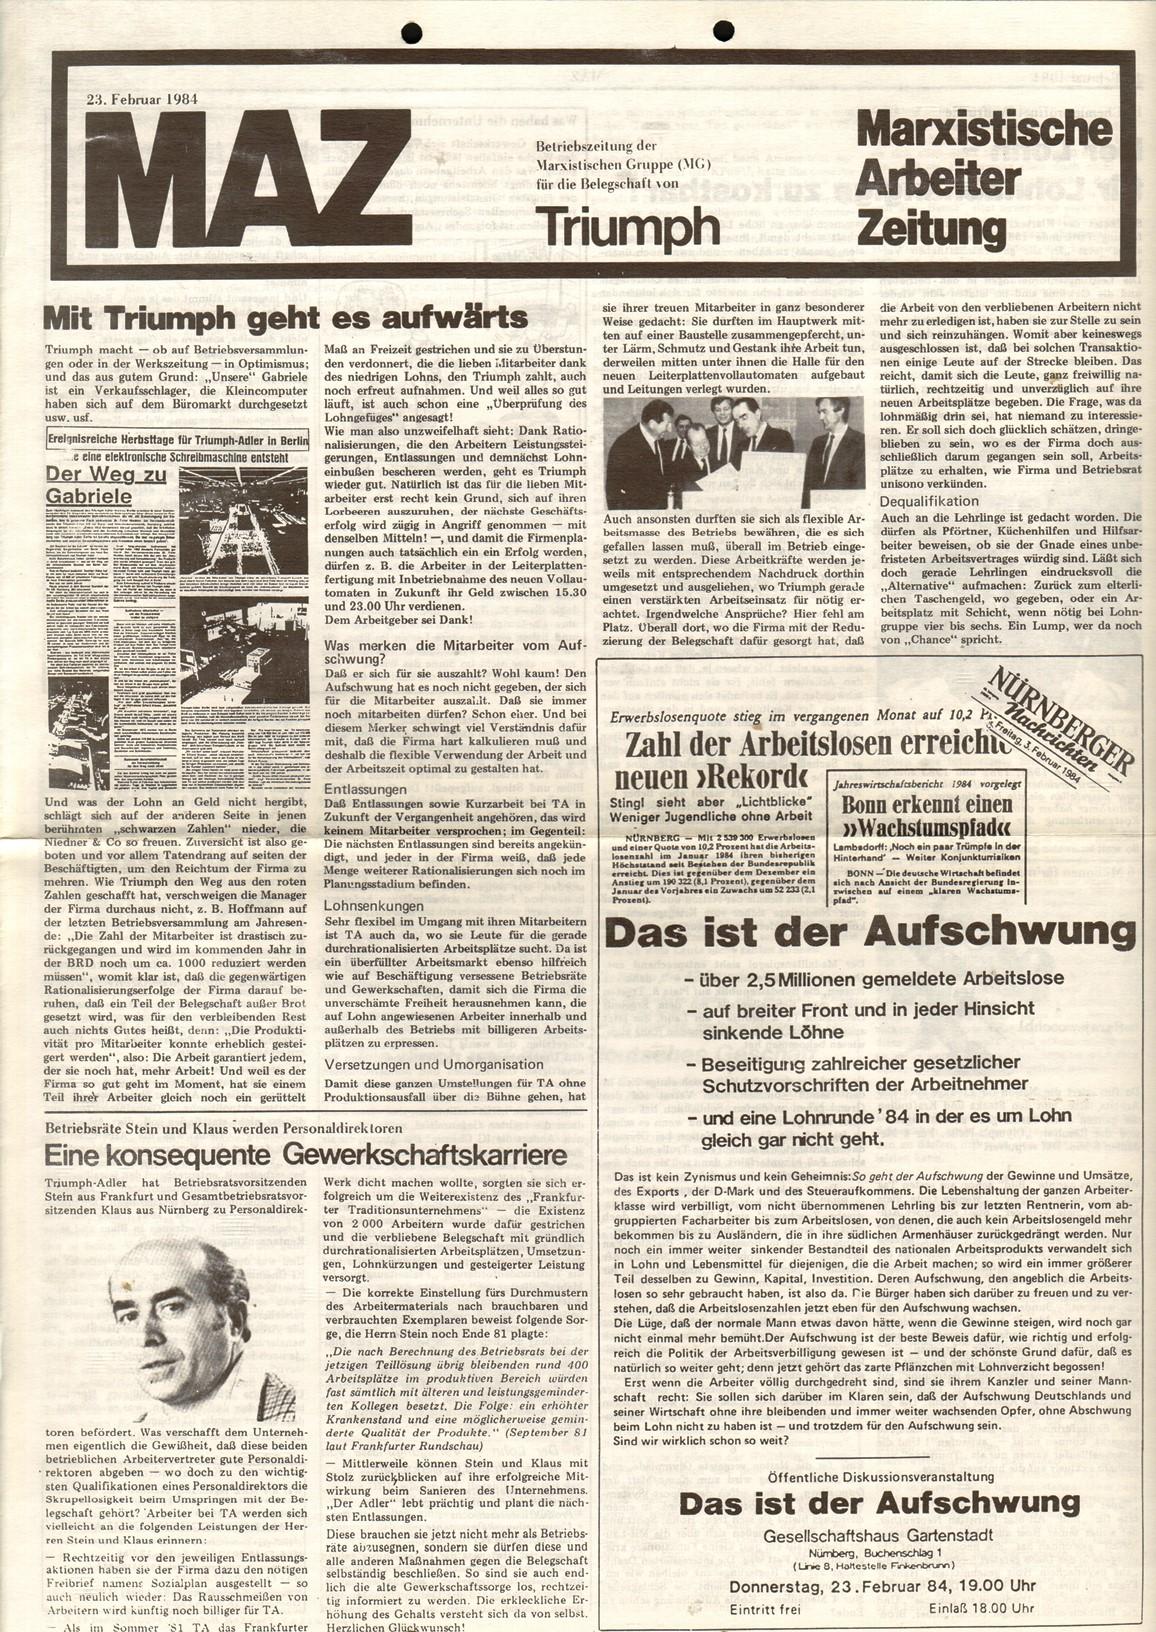 Nuernberg_MG_MAZ_Triumph_19840223_01